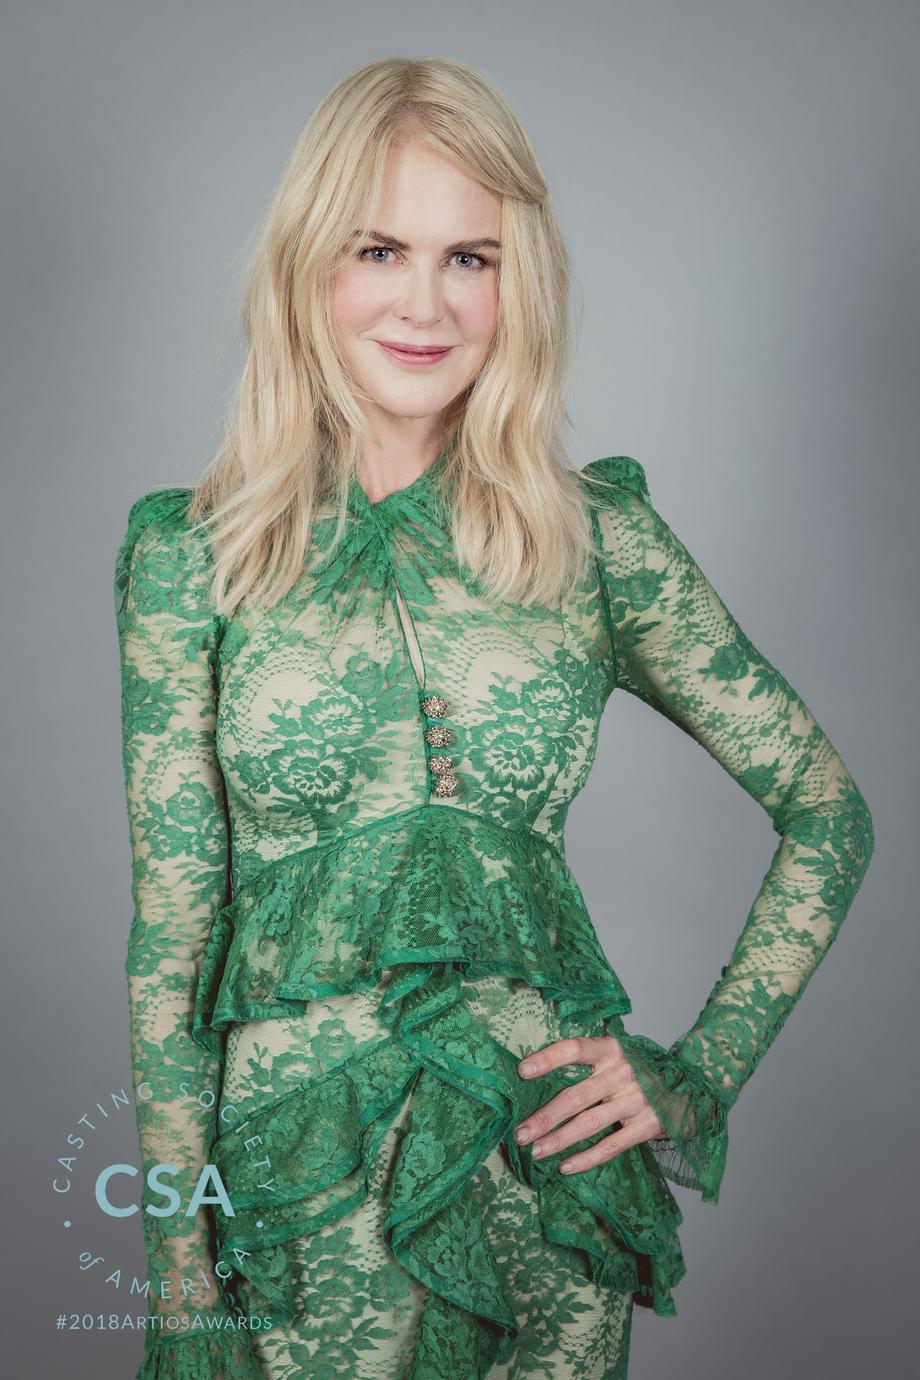 Nicole Kidman - photo credit: Lisa Kelly Remerowski